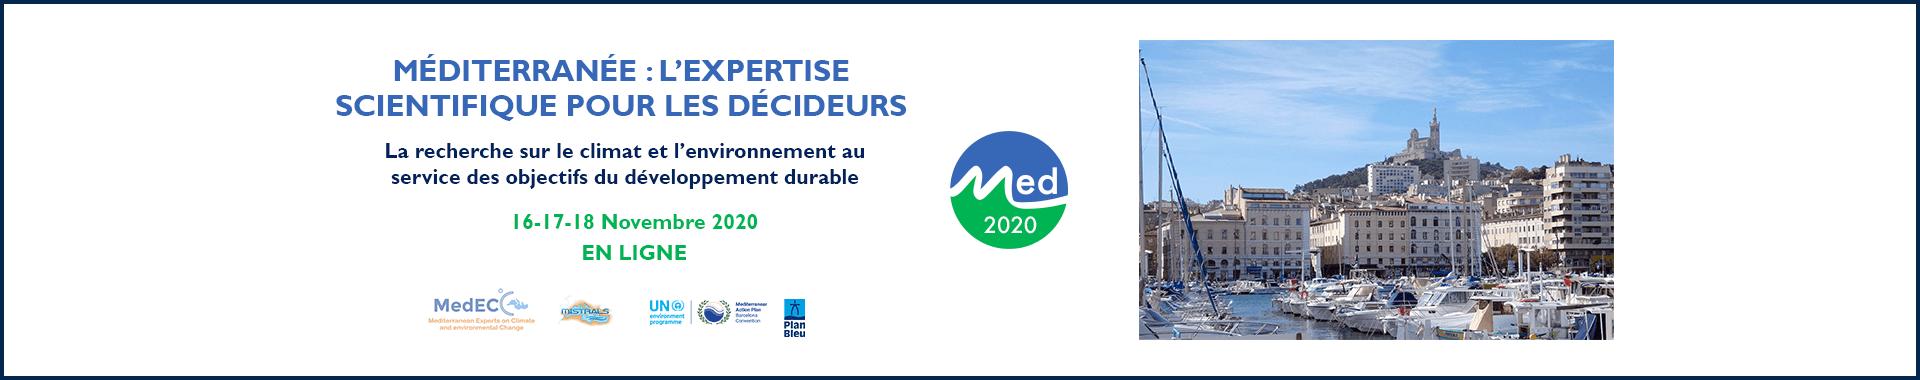 MED 2020 Bannière